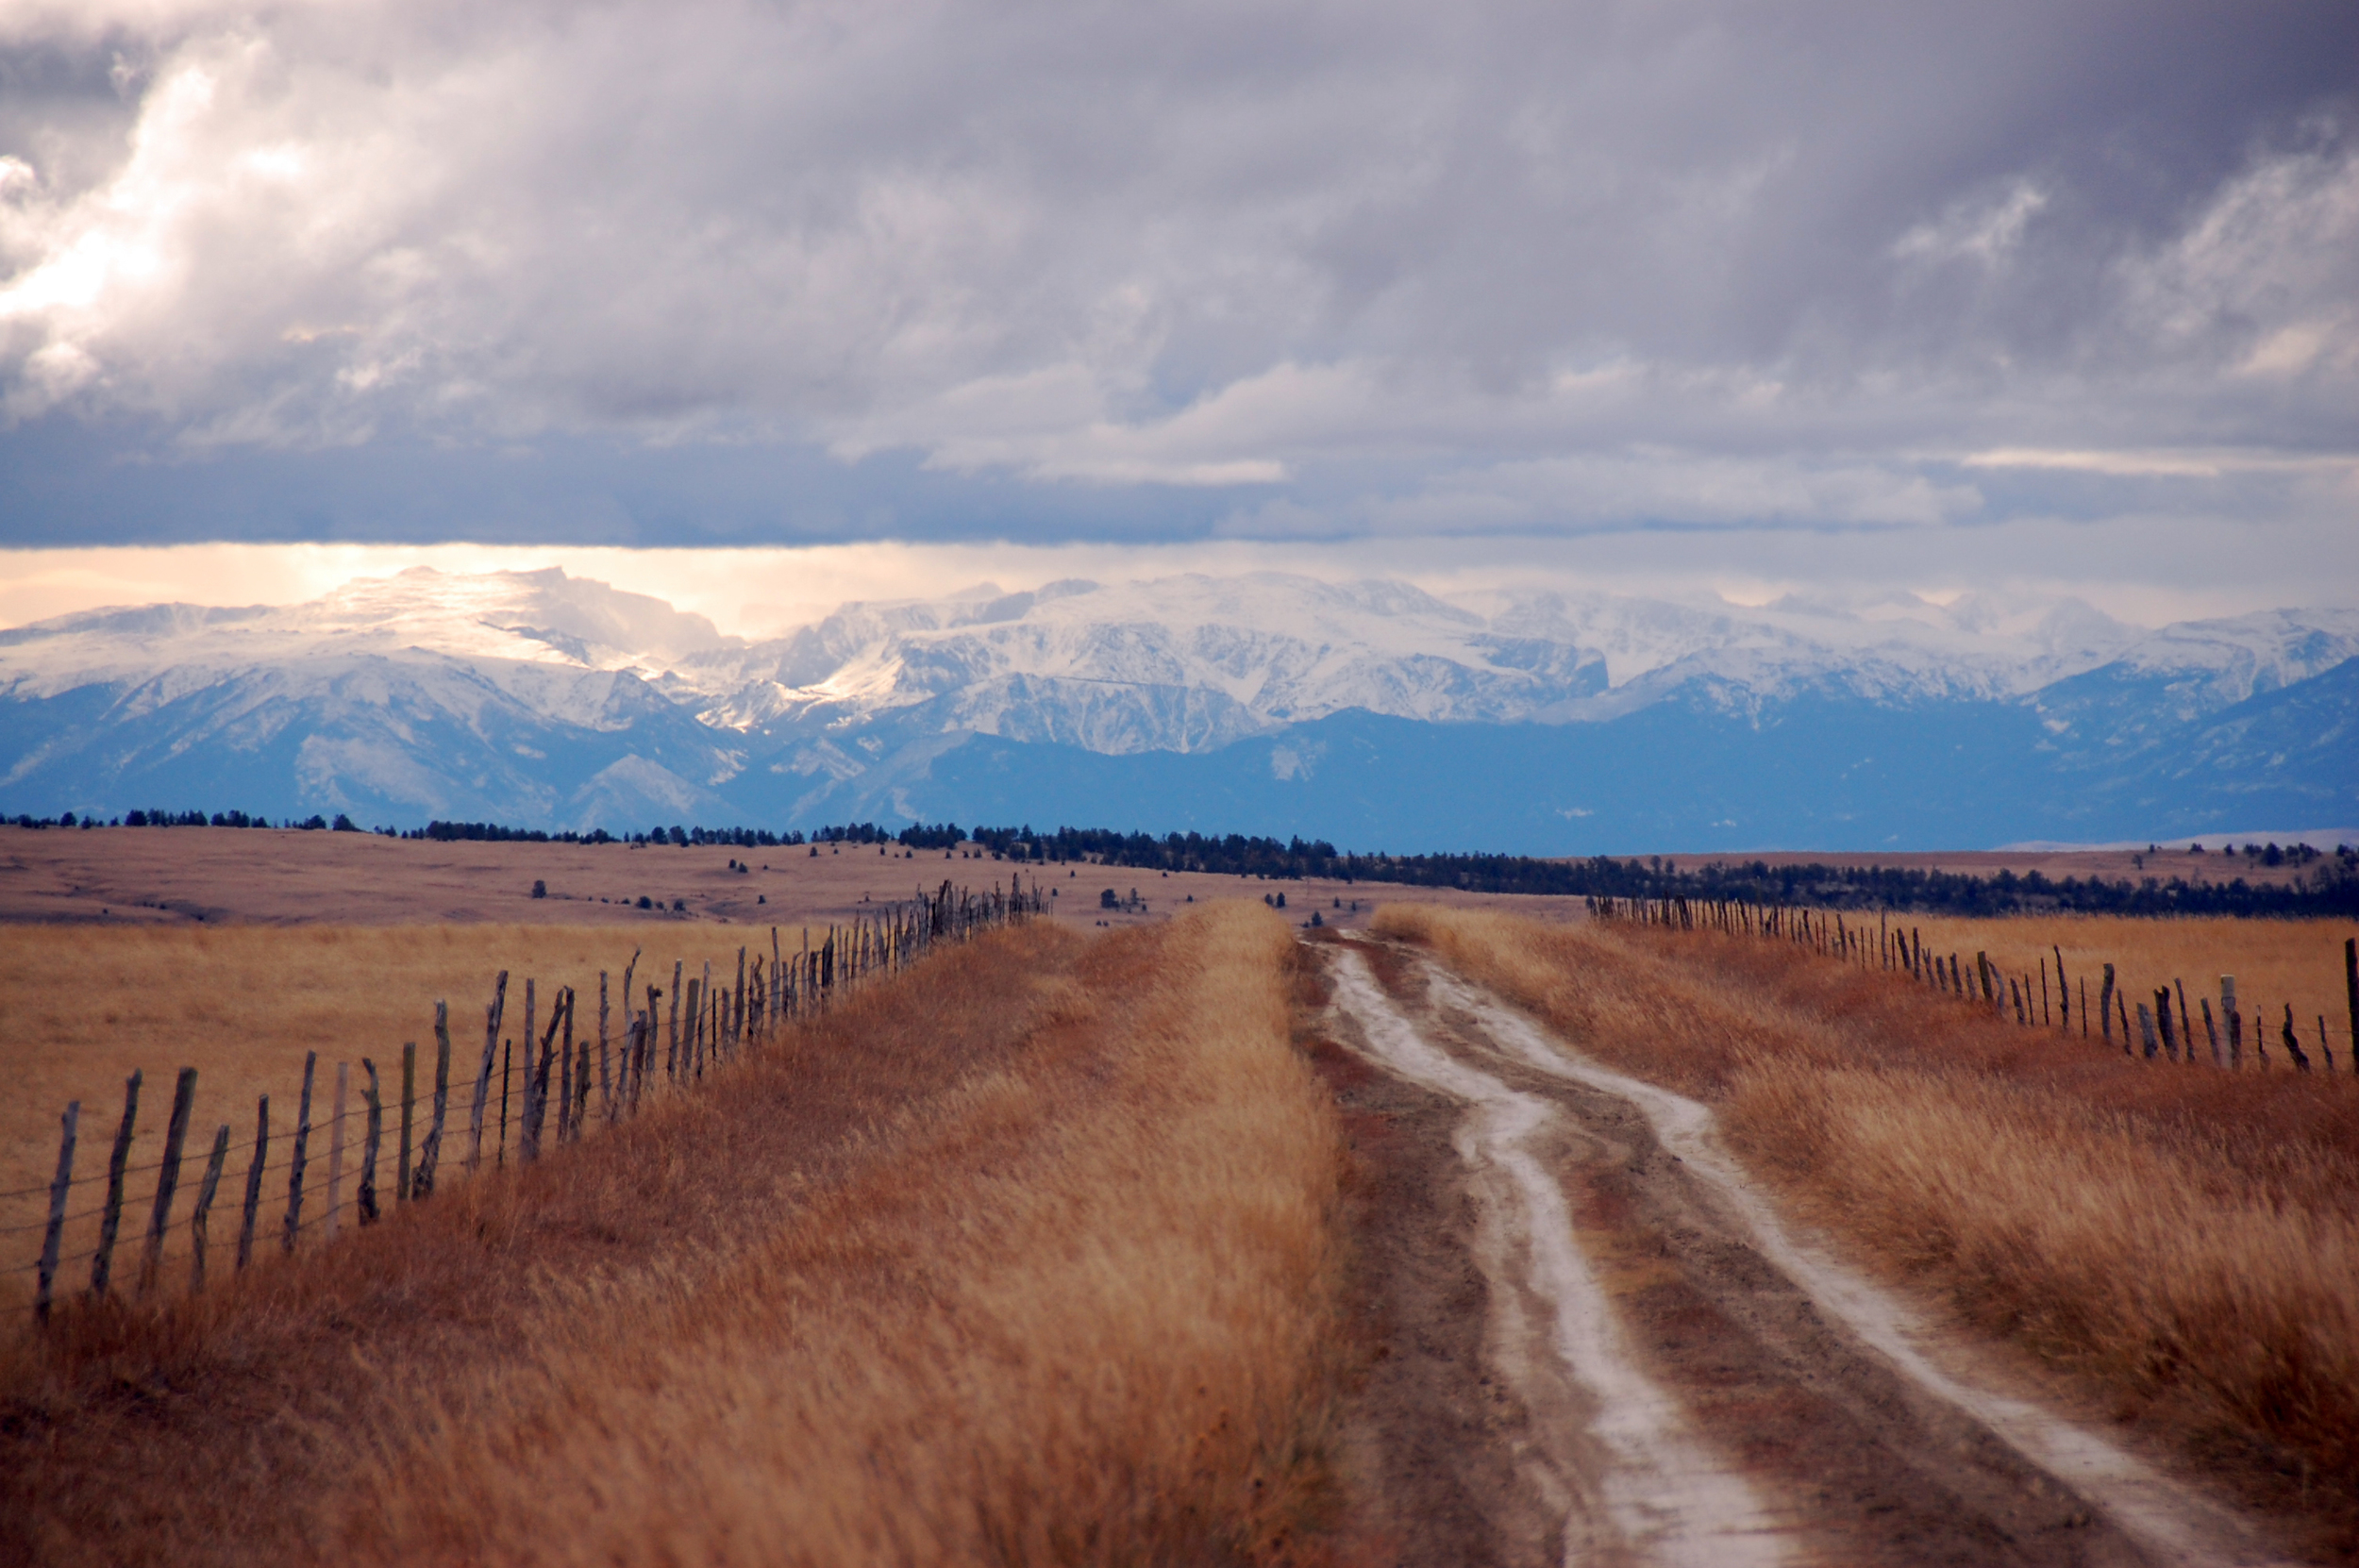 Interior road on Montana ranch